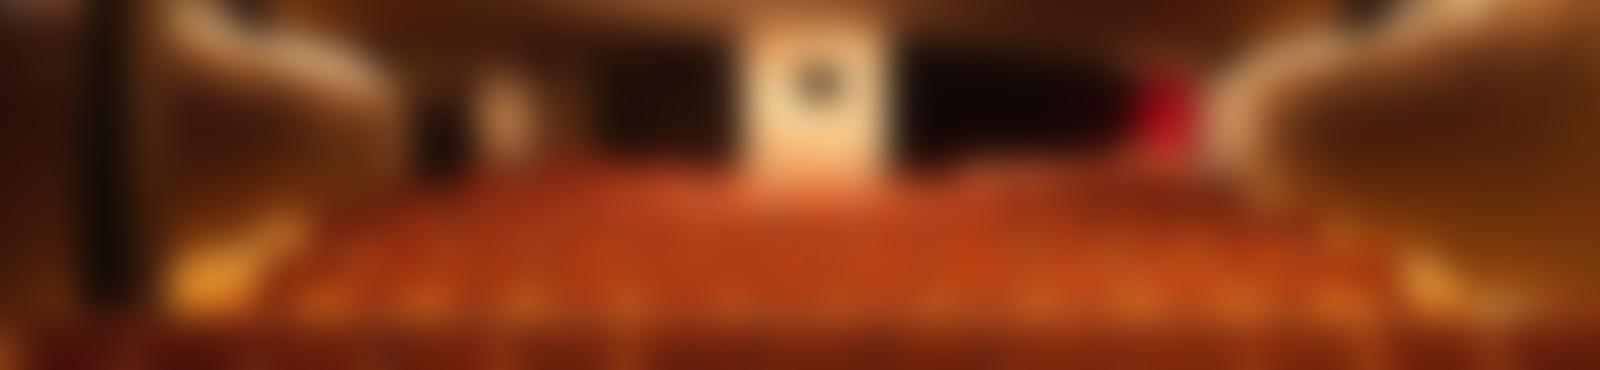 Blurred a9477b0e ad1b 4725 b901 25b1b2c9c769